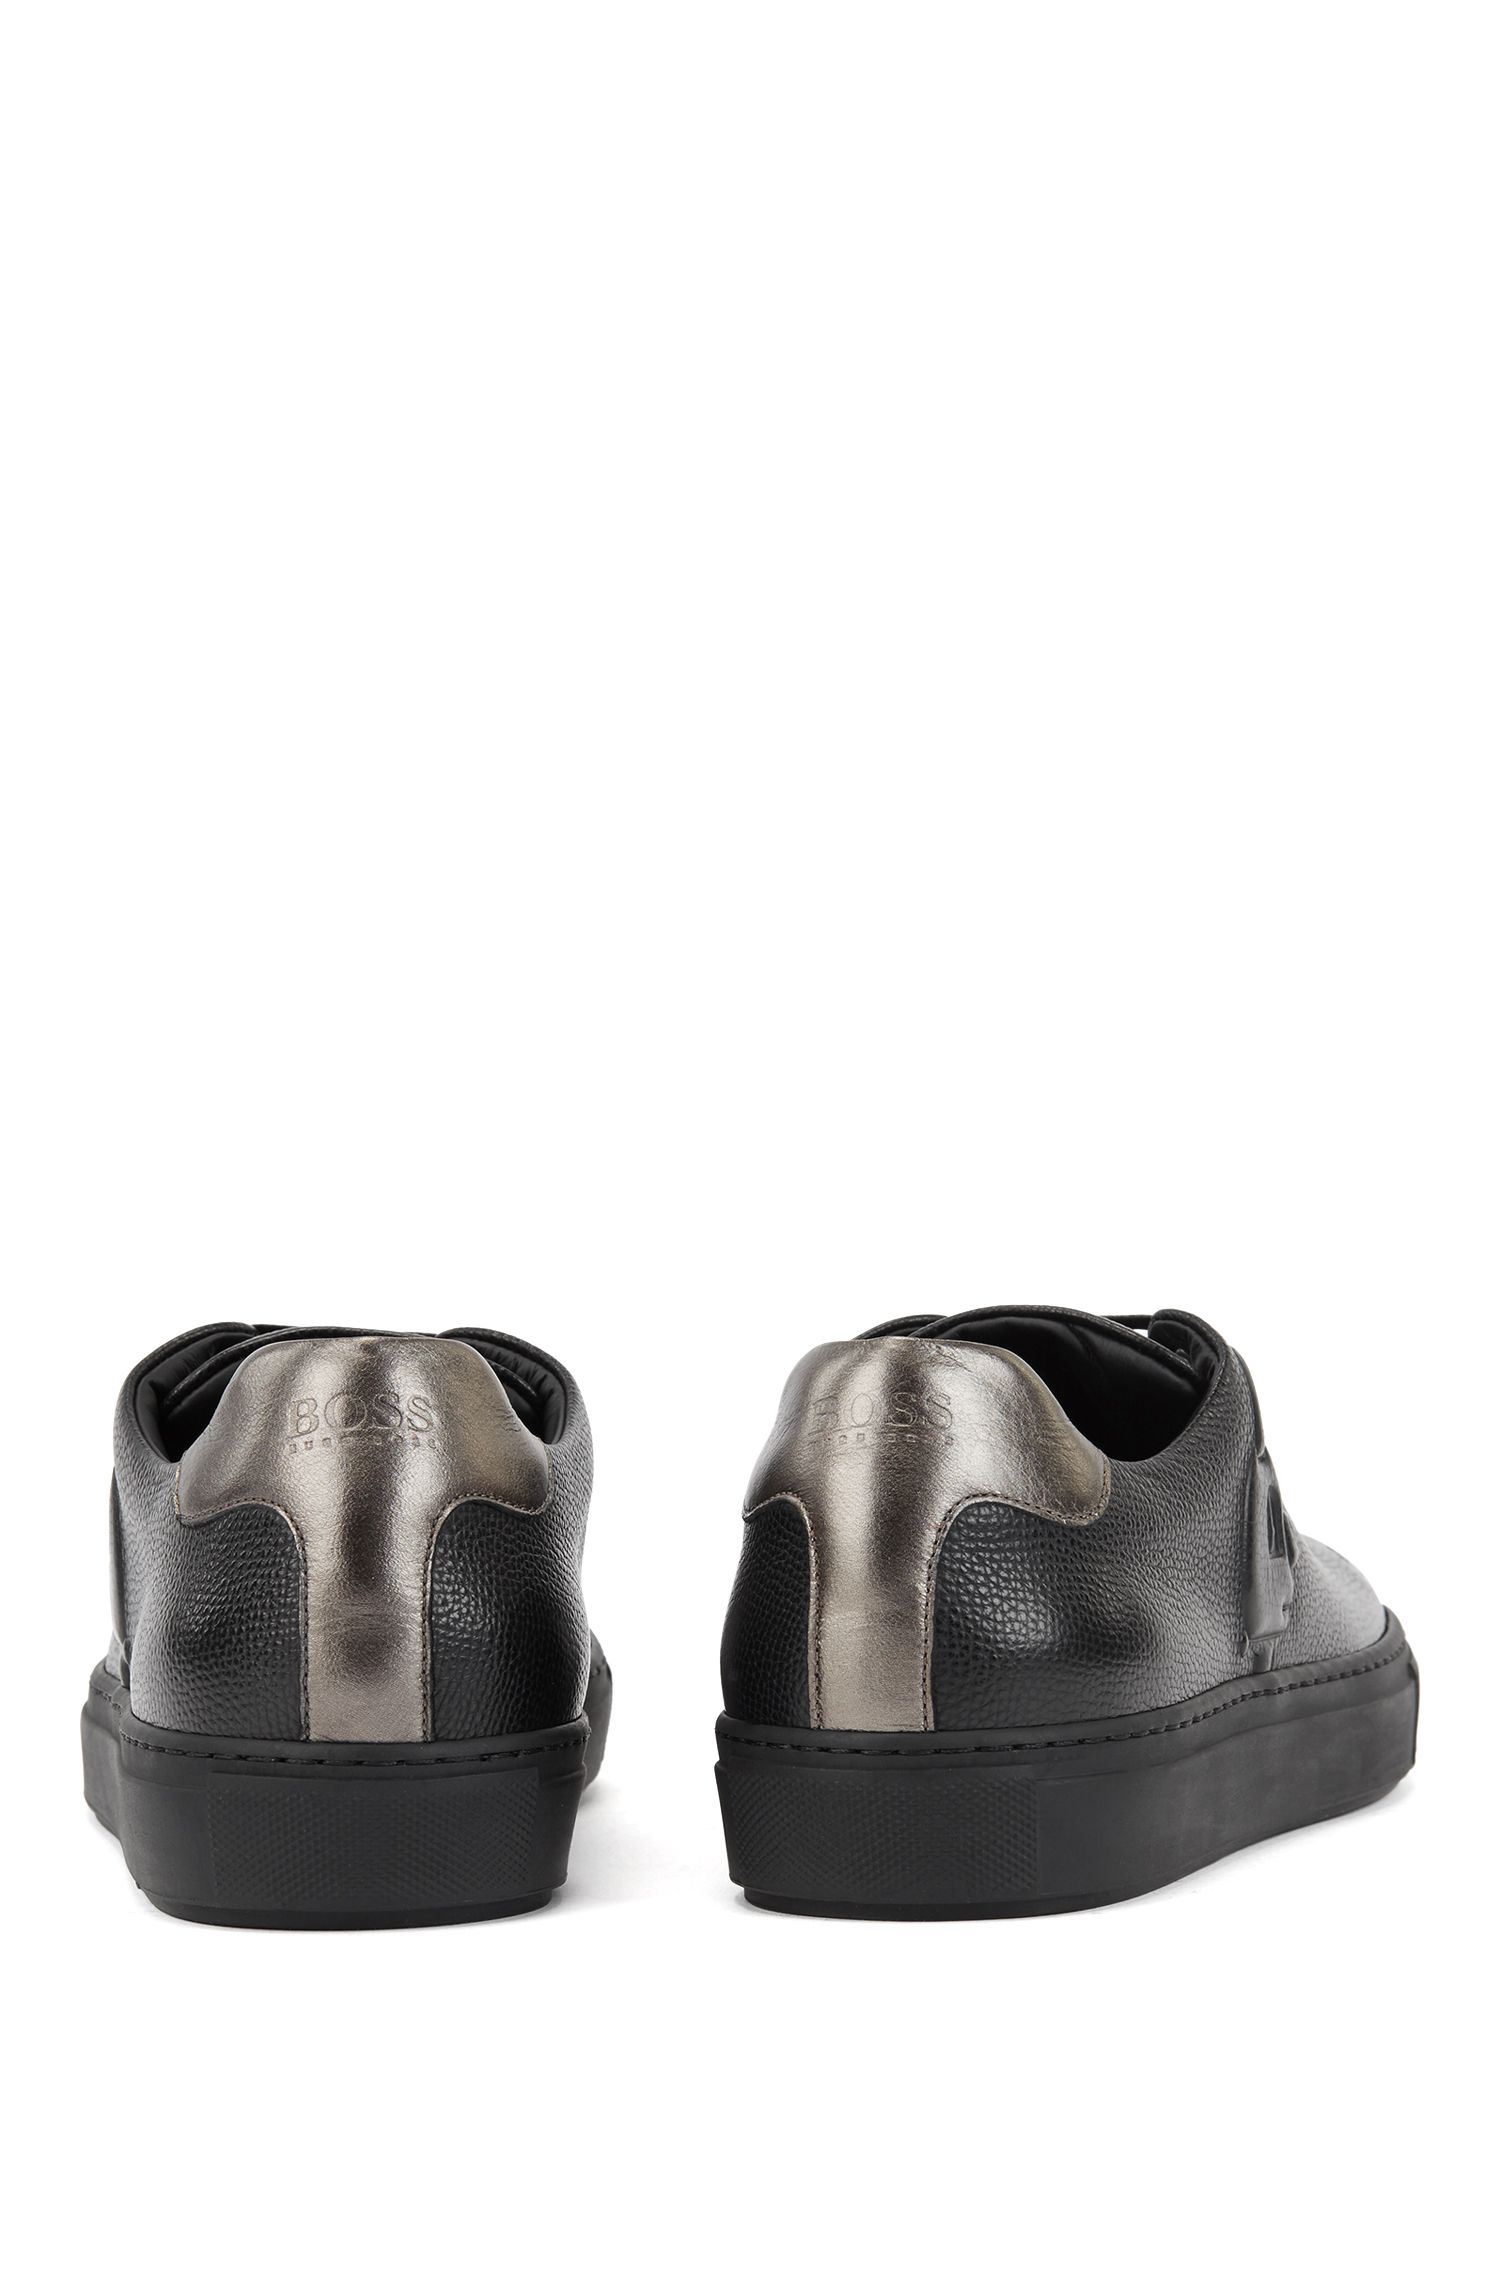 Limited Edition Ledersneakers mit geprägtem Jeremyville-Hasen, Schwarz